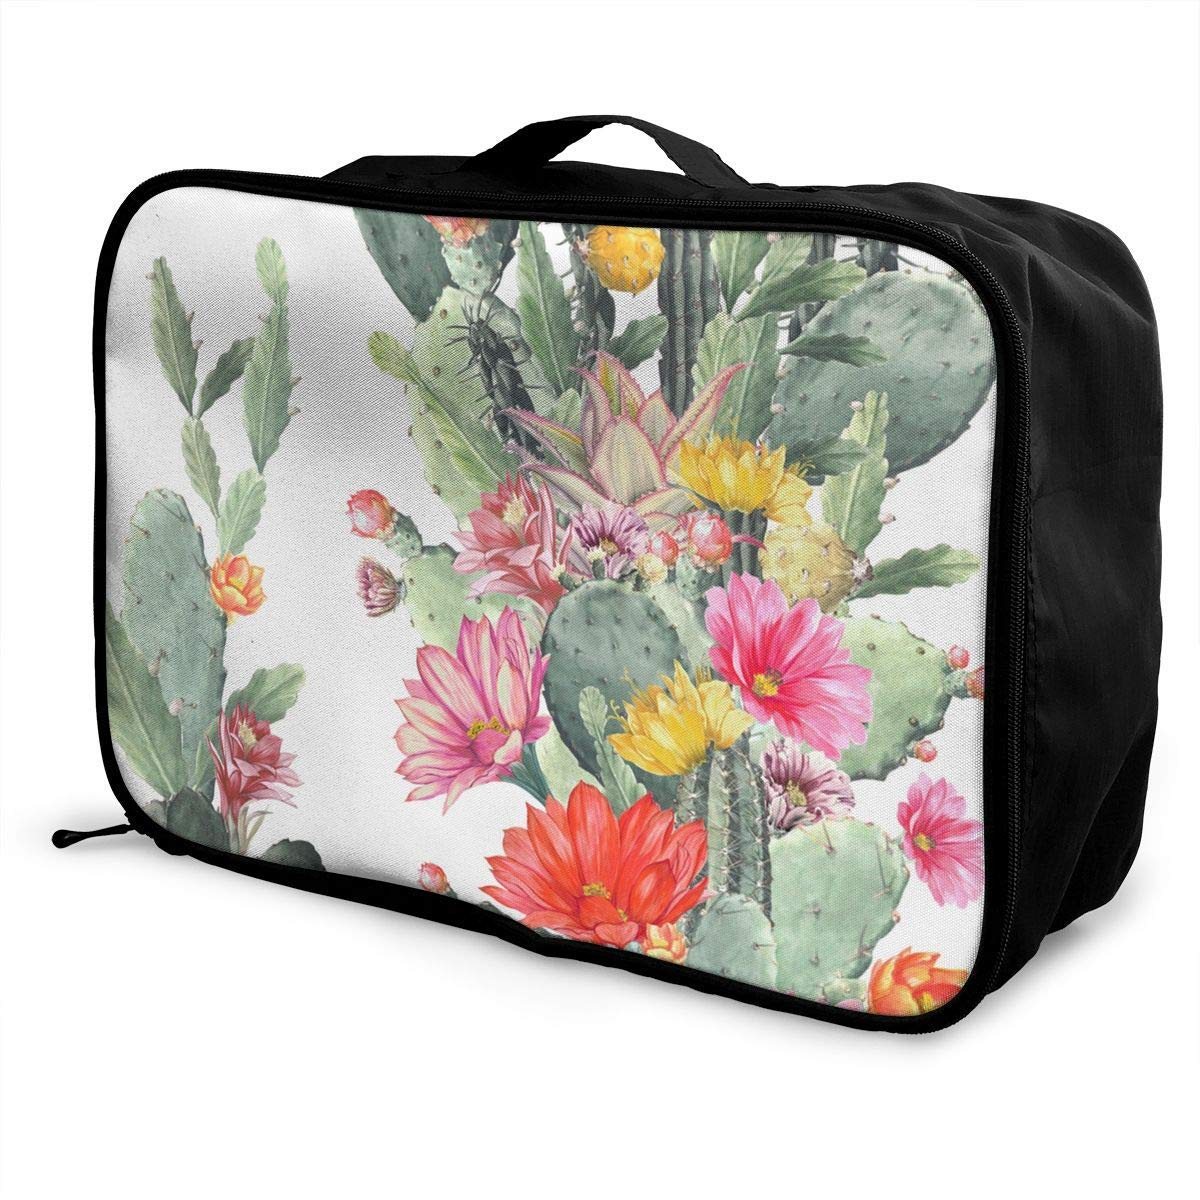 Wilder California Prickly Pear Cactus Travel Duffel Bag Waterproof Fashion Lightweight Large Capacity Portable Duffel Bag for Men /& Women JTRVW Luggage Bags for Travel